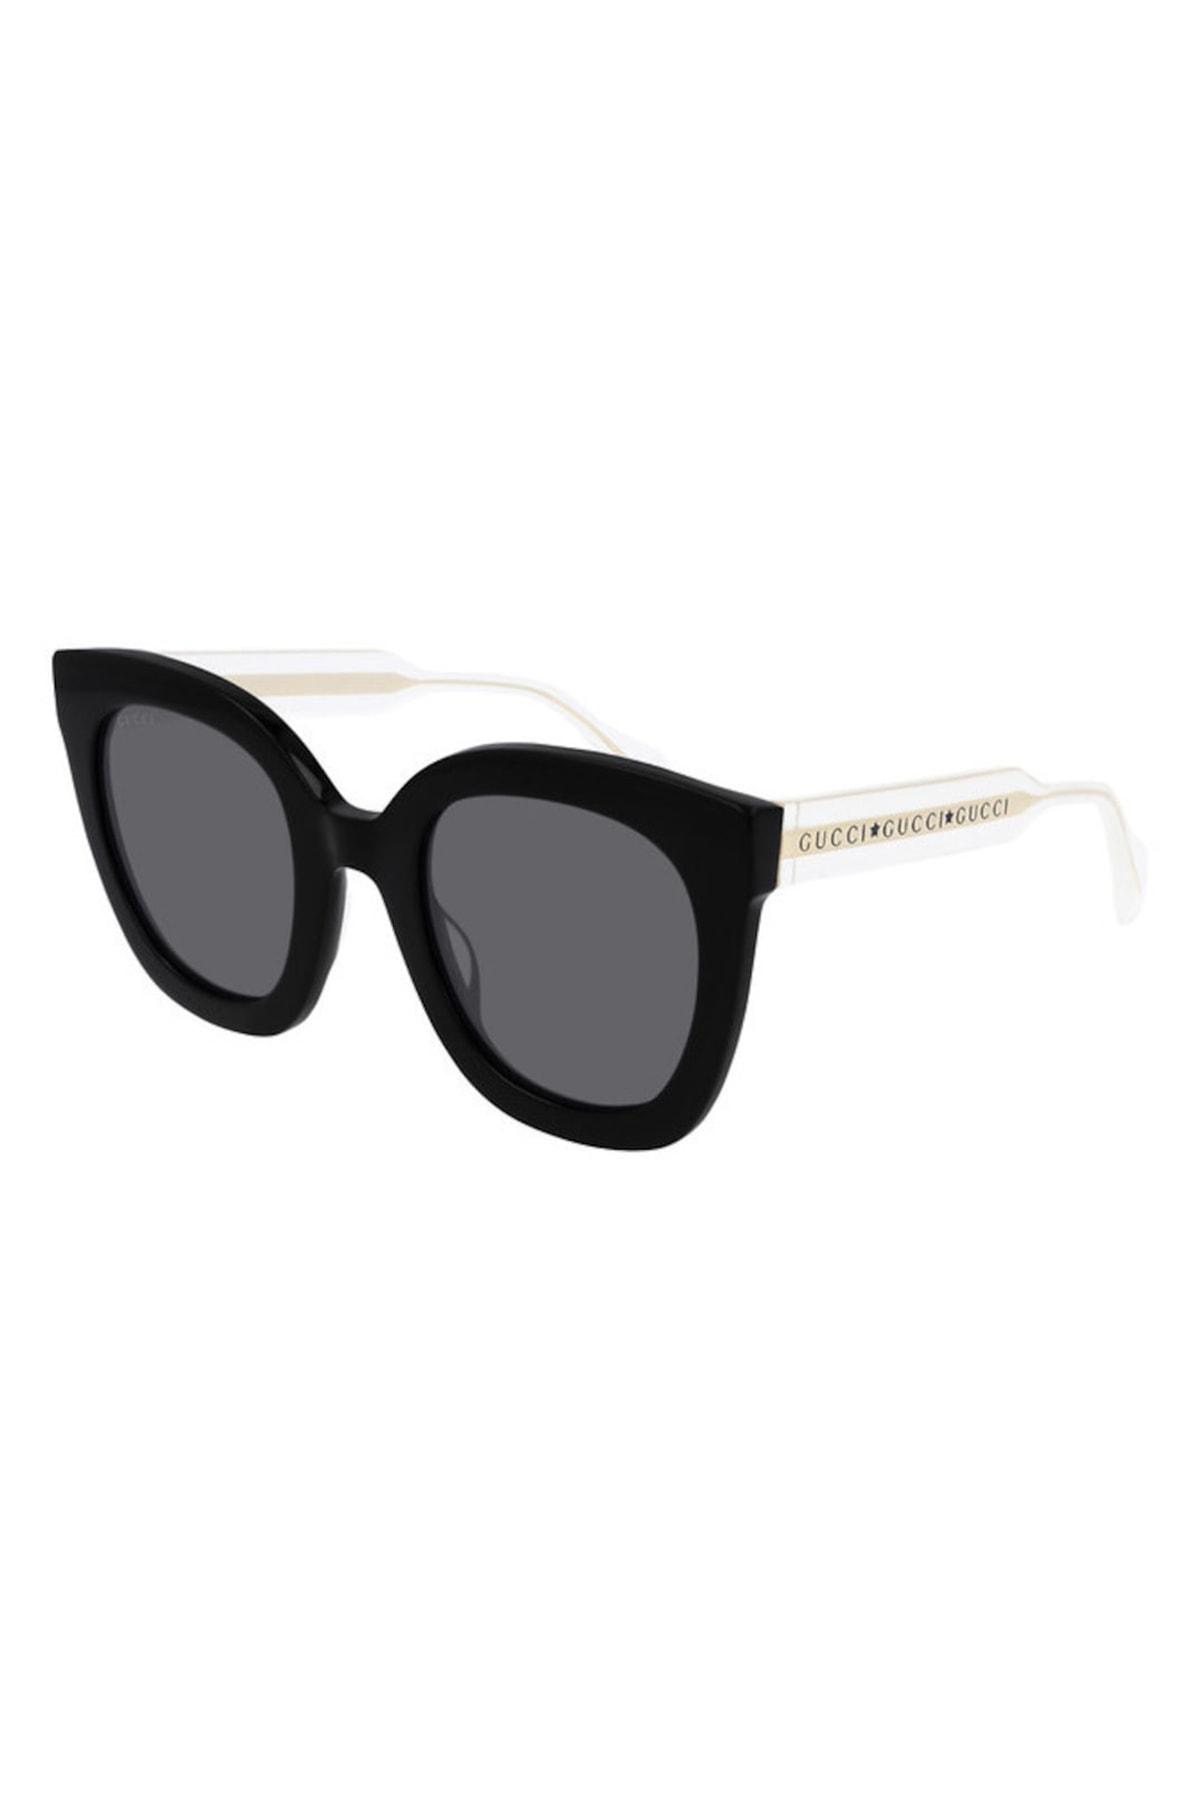 Gucci Kadın Güneş Gözlüğü GG0564S 001